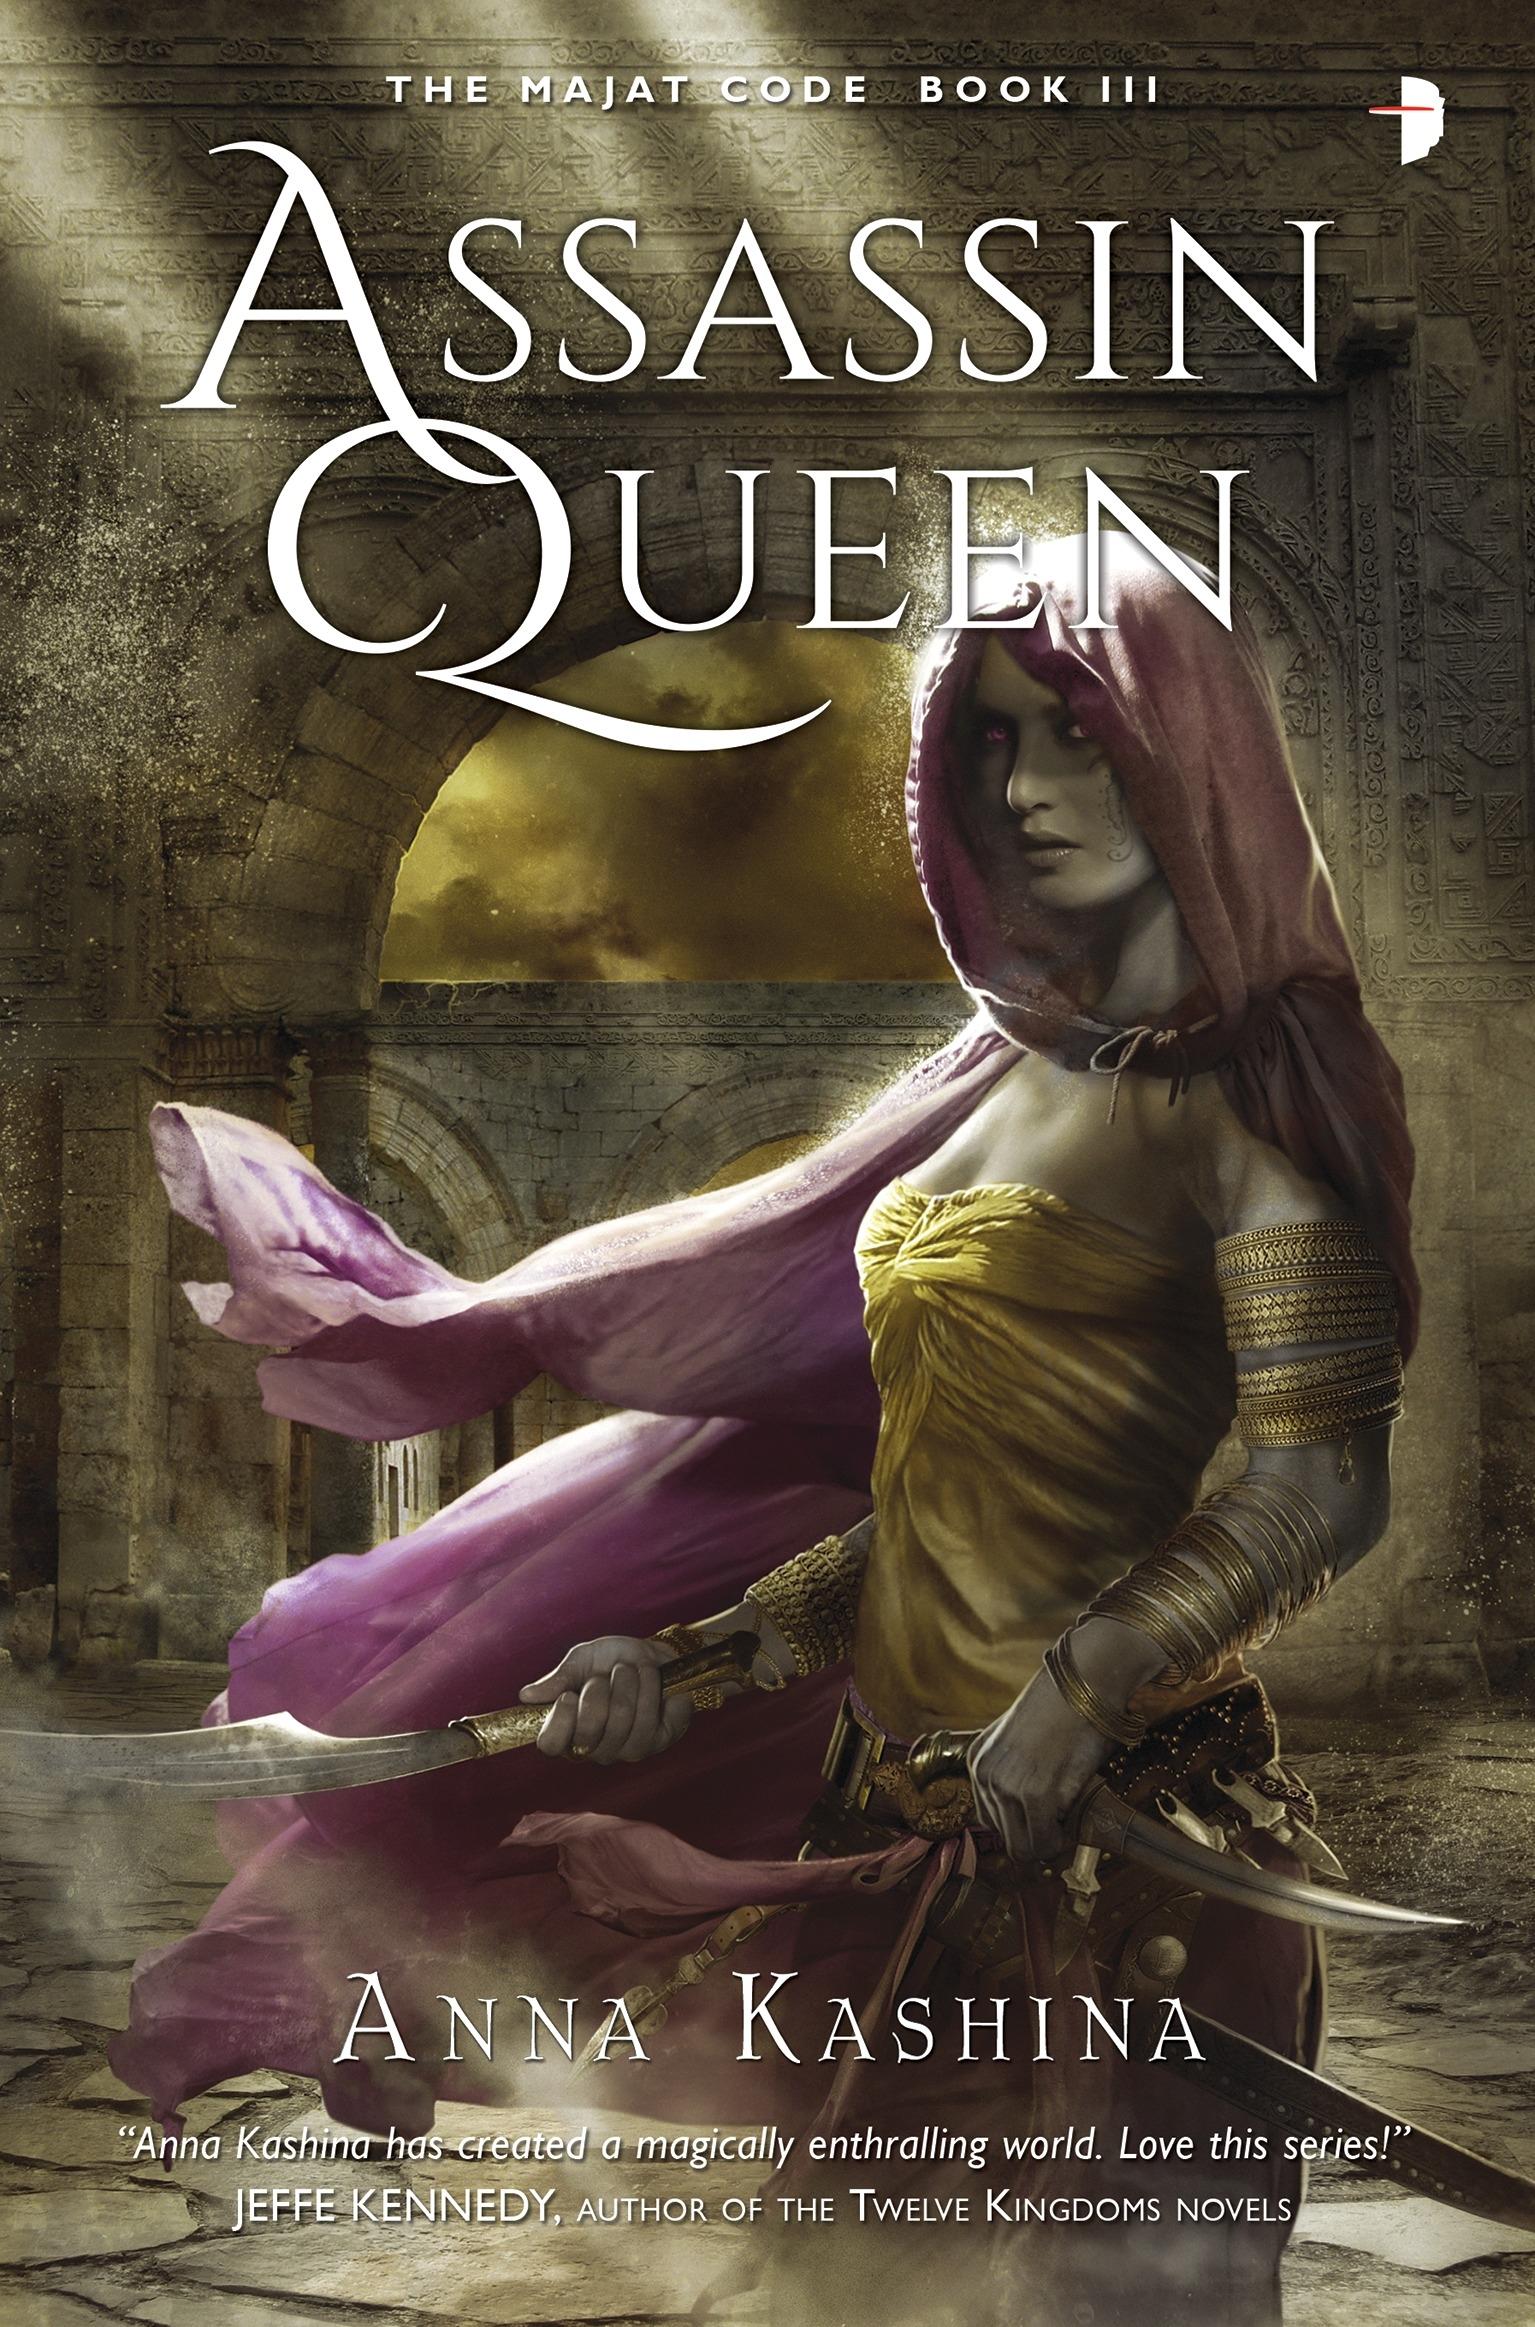 Assassin Queen by Anna Kashina - Penguin Books Australia